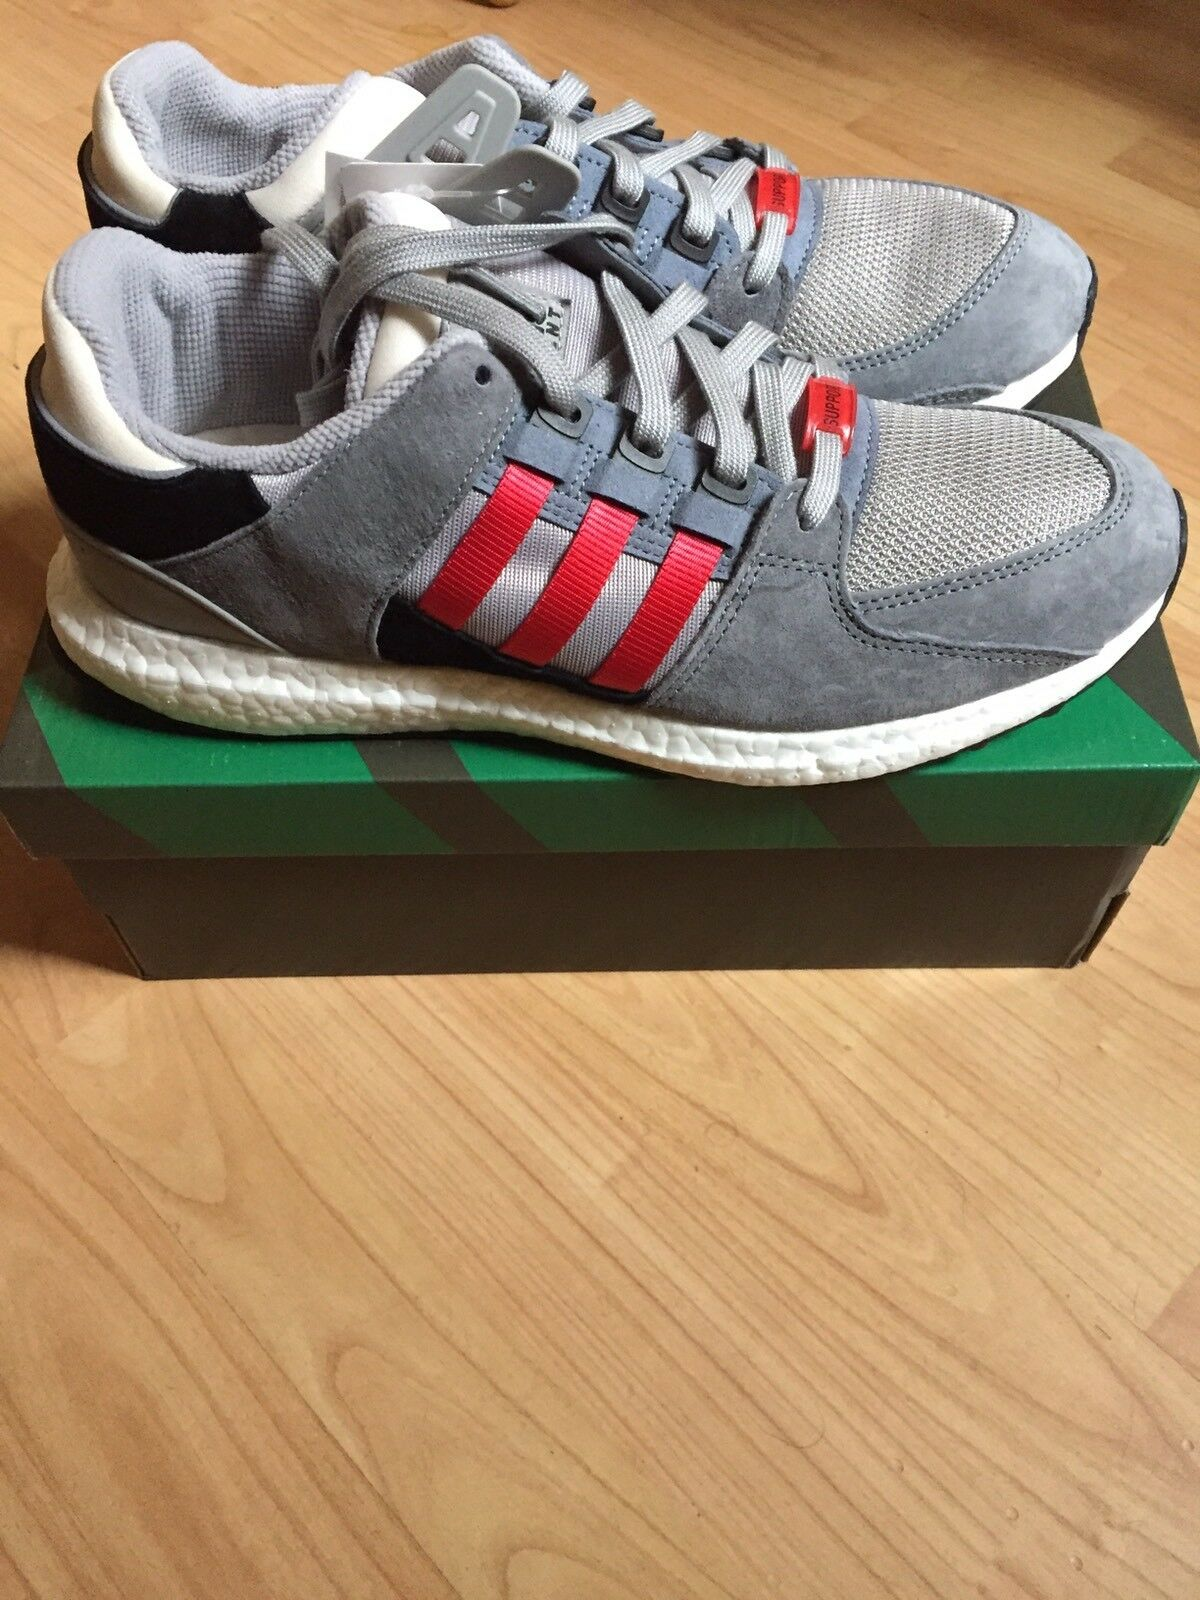 Adidas Equipment Support 93 16 UK10